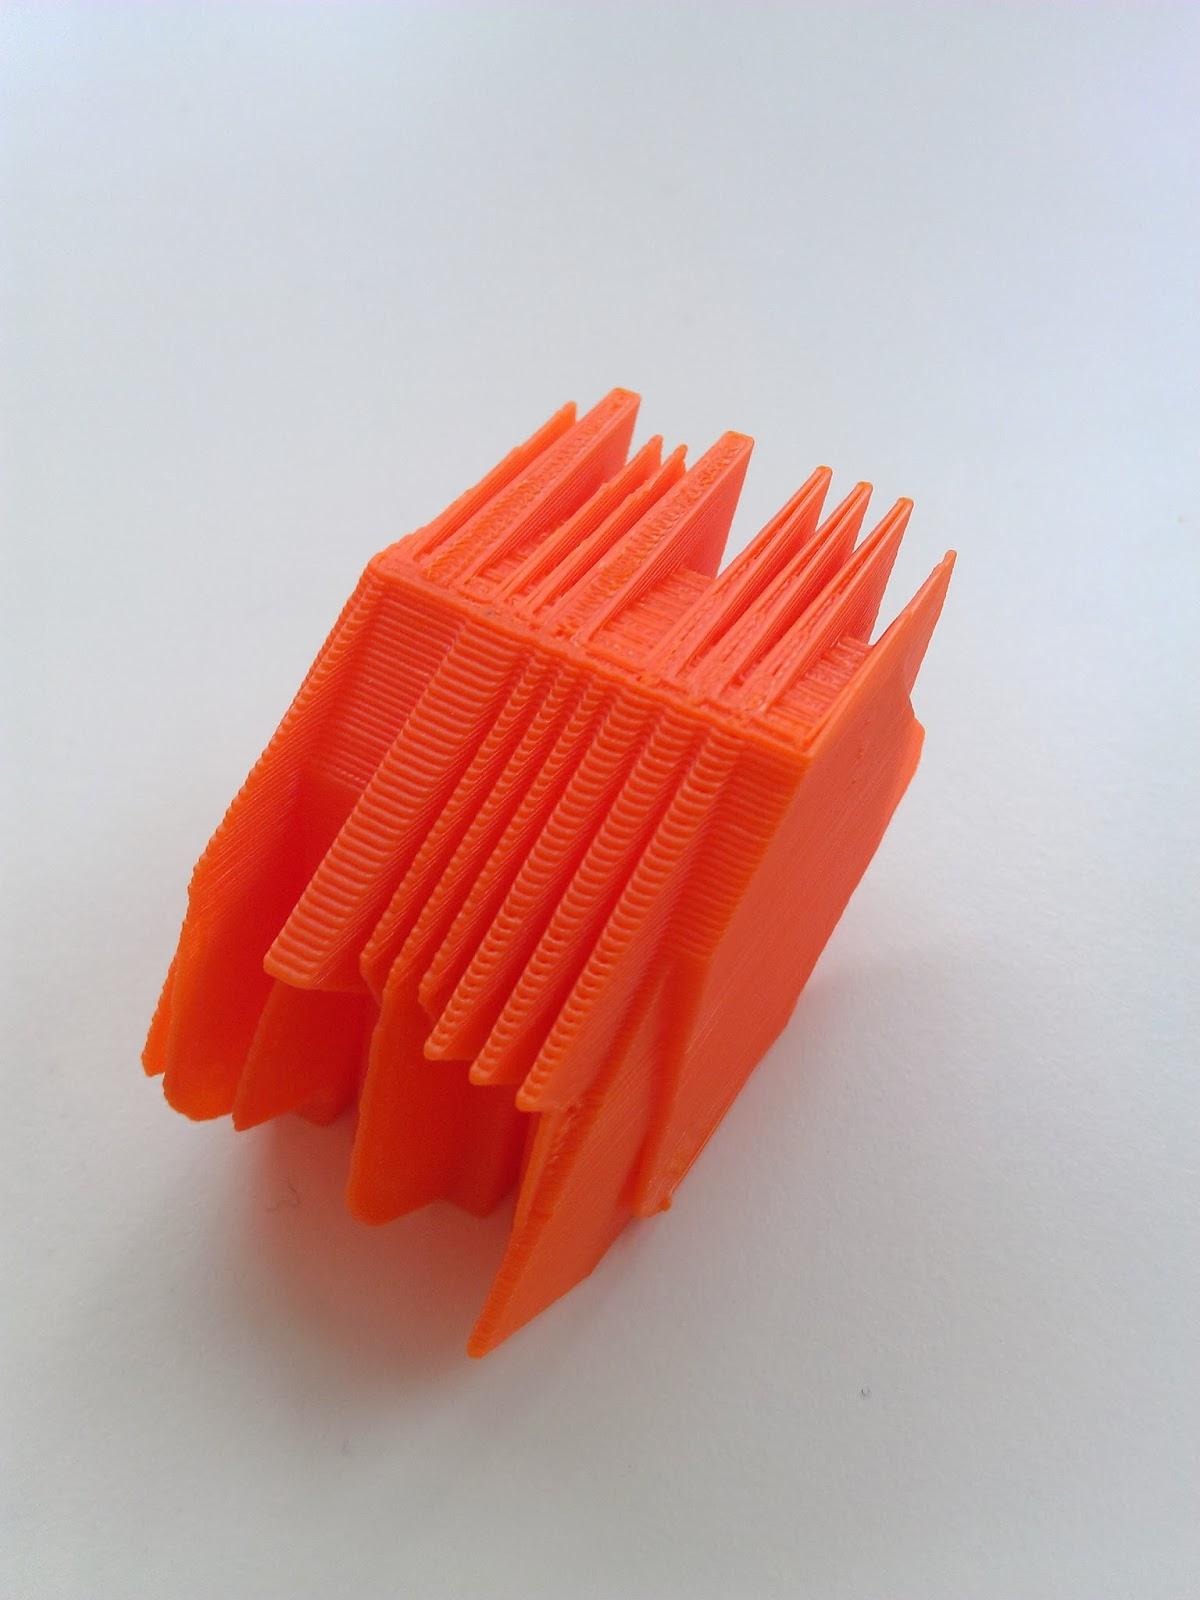 DIY 3D Printing: Object Steganography Method To Hide Data